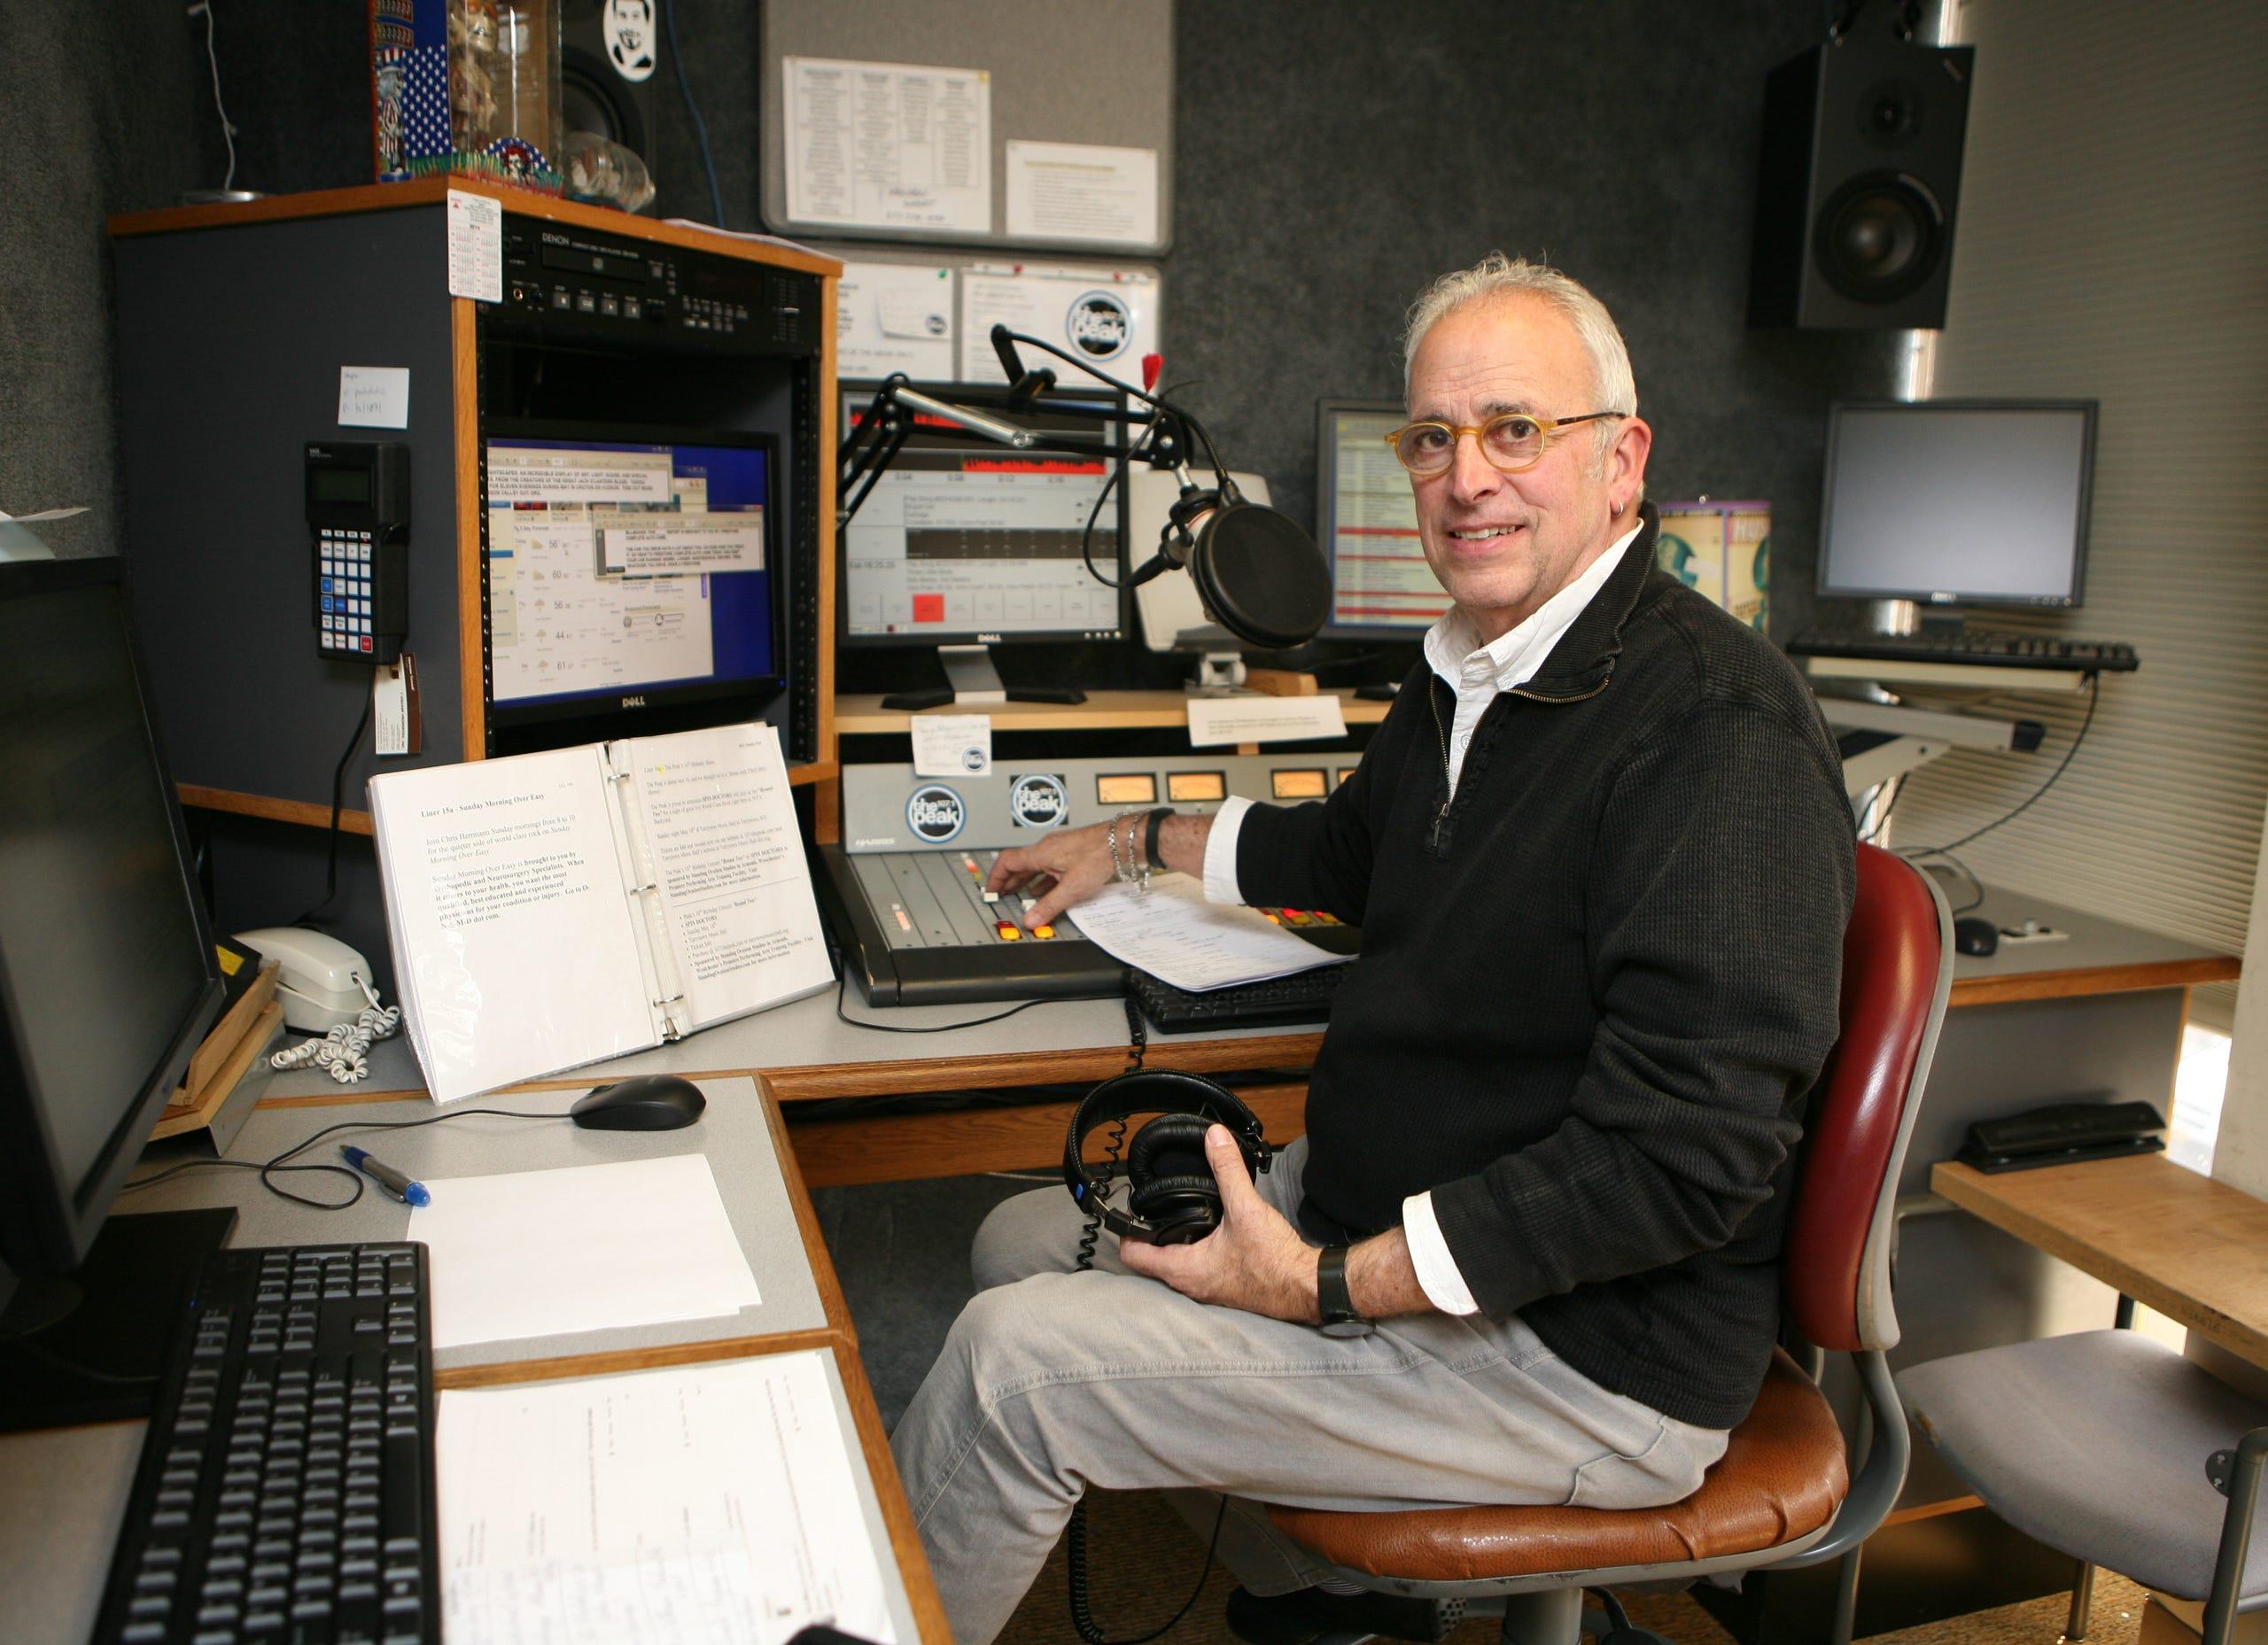 Wplj Farewell Playlist Former 95 5 Dj Jimmy Fink Makes His Picks